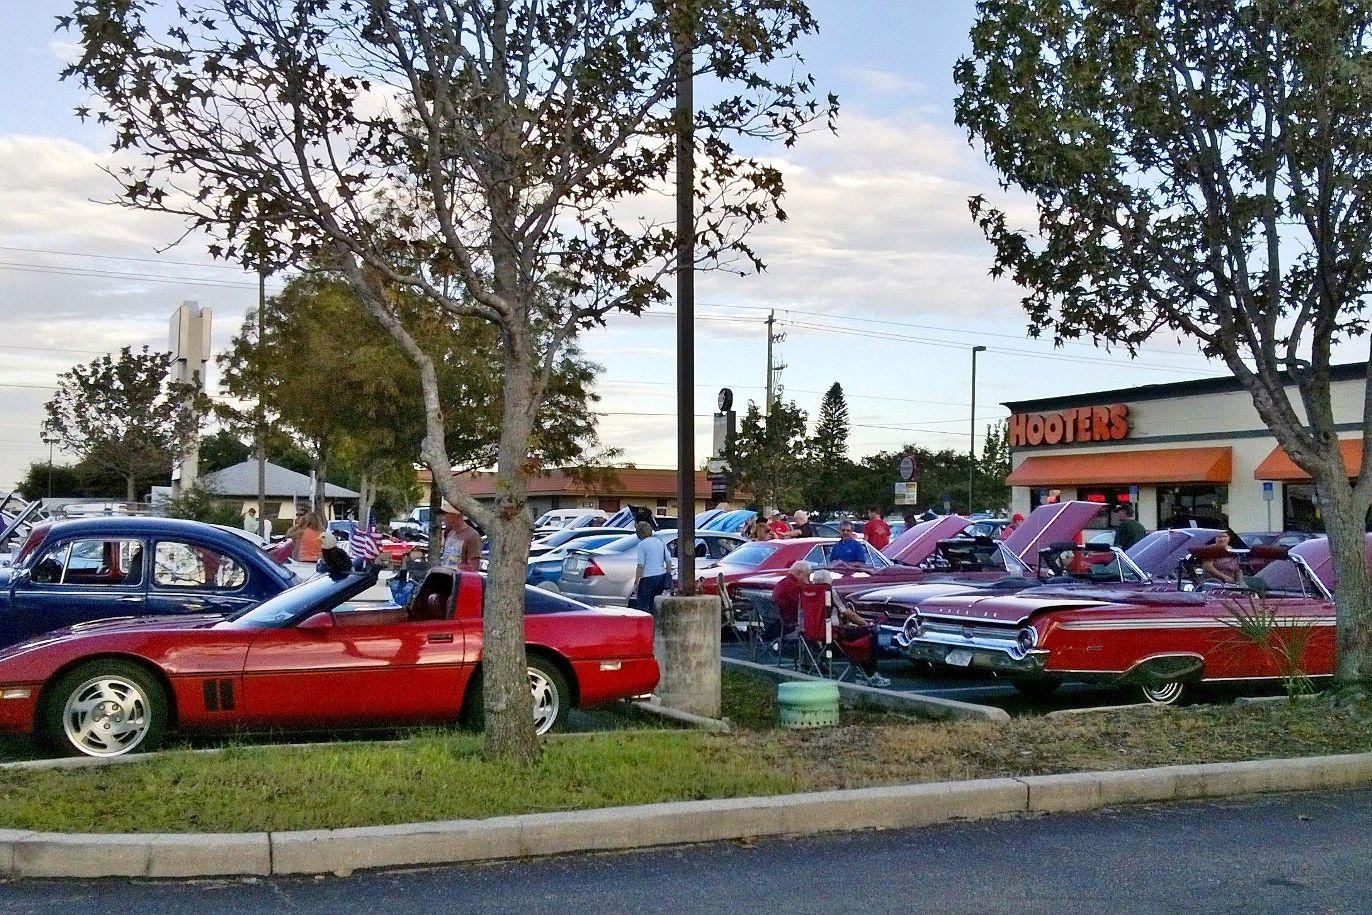 Car Show tonight at Hooters in Bradenton (Plantation, Sarasota ...